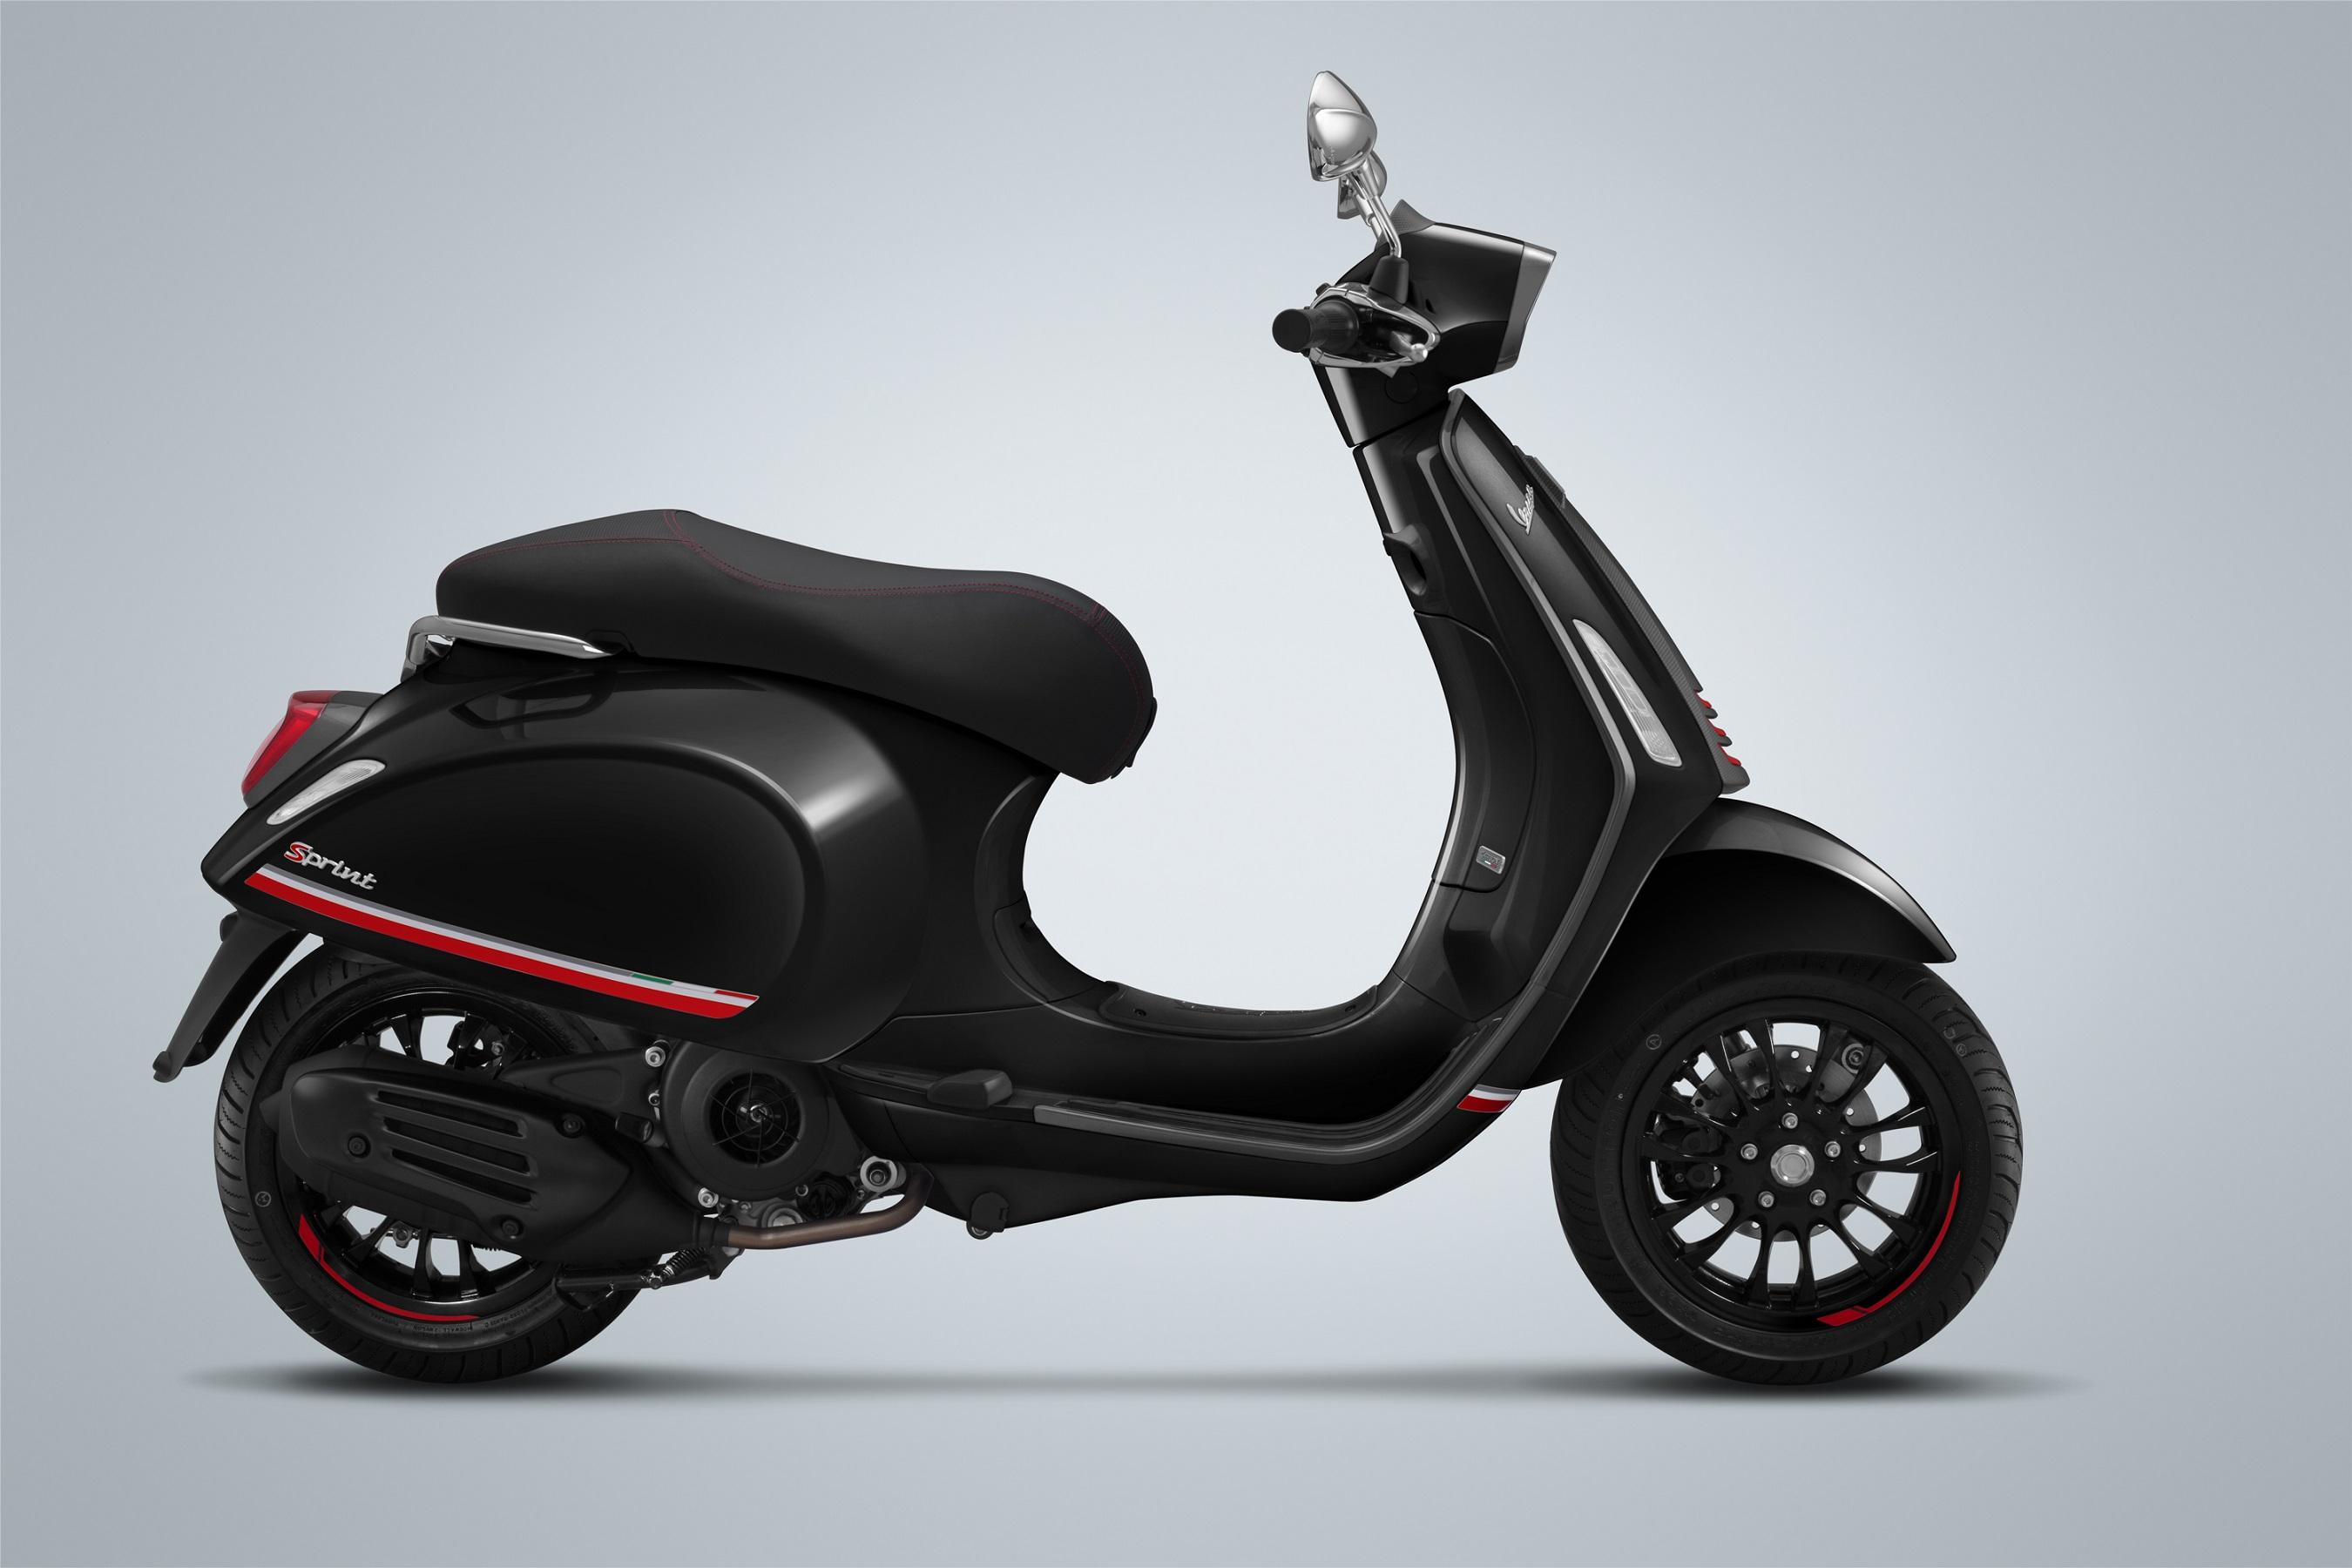 So Sánh Giá Xe Máy Vespa Sprint Carbon 125cc 2019